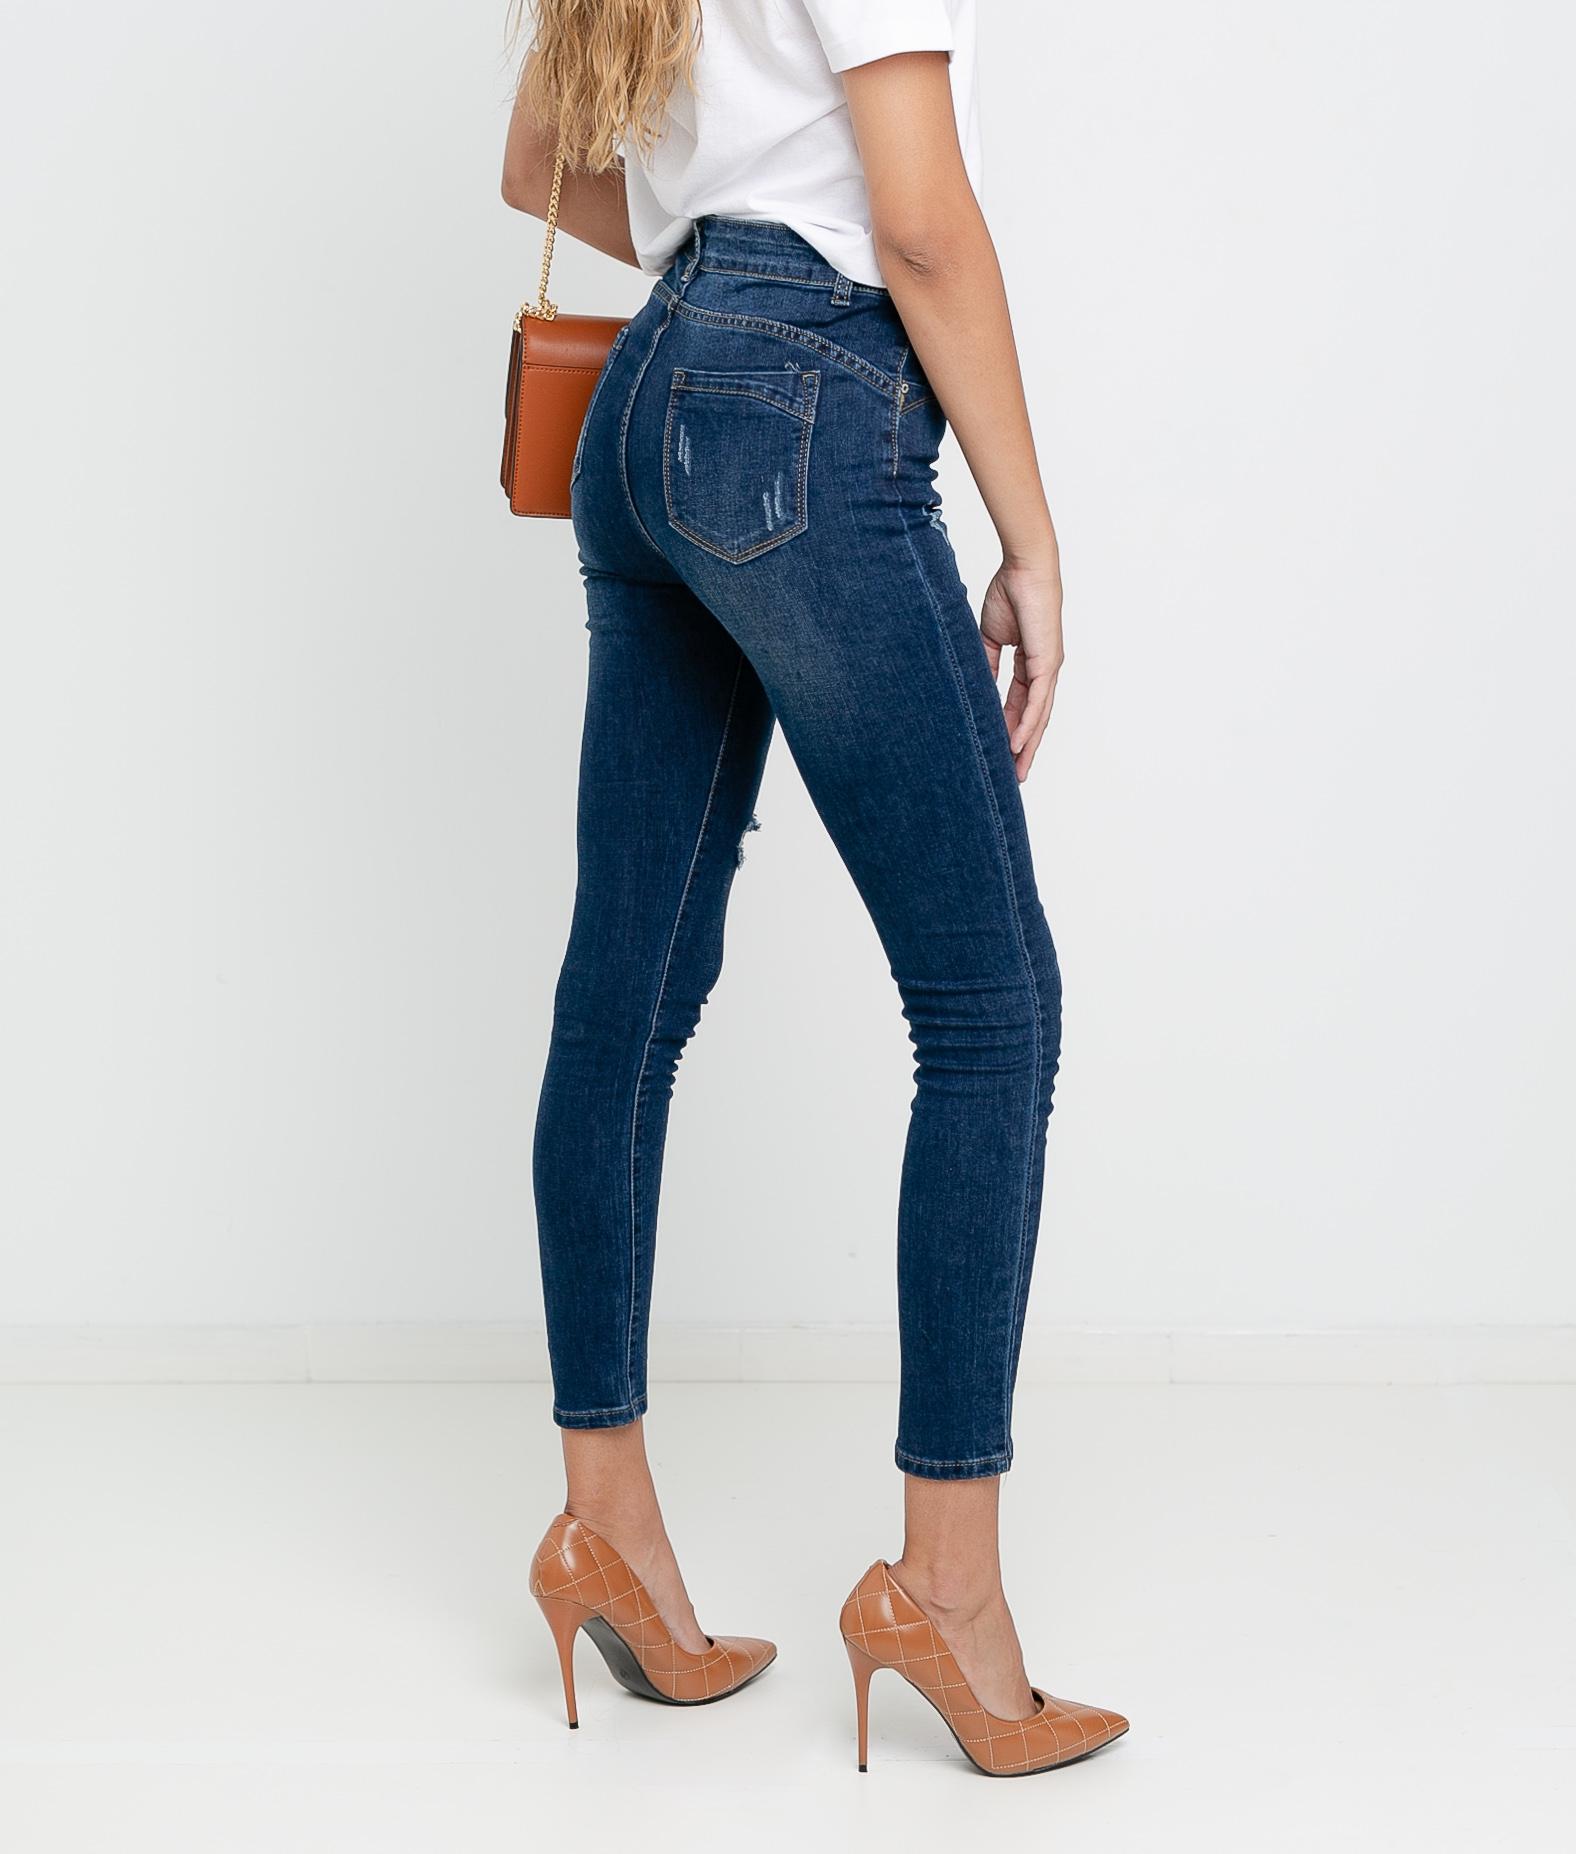 Pantalon Borie - Denim